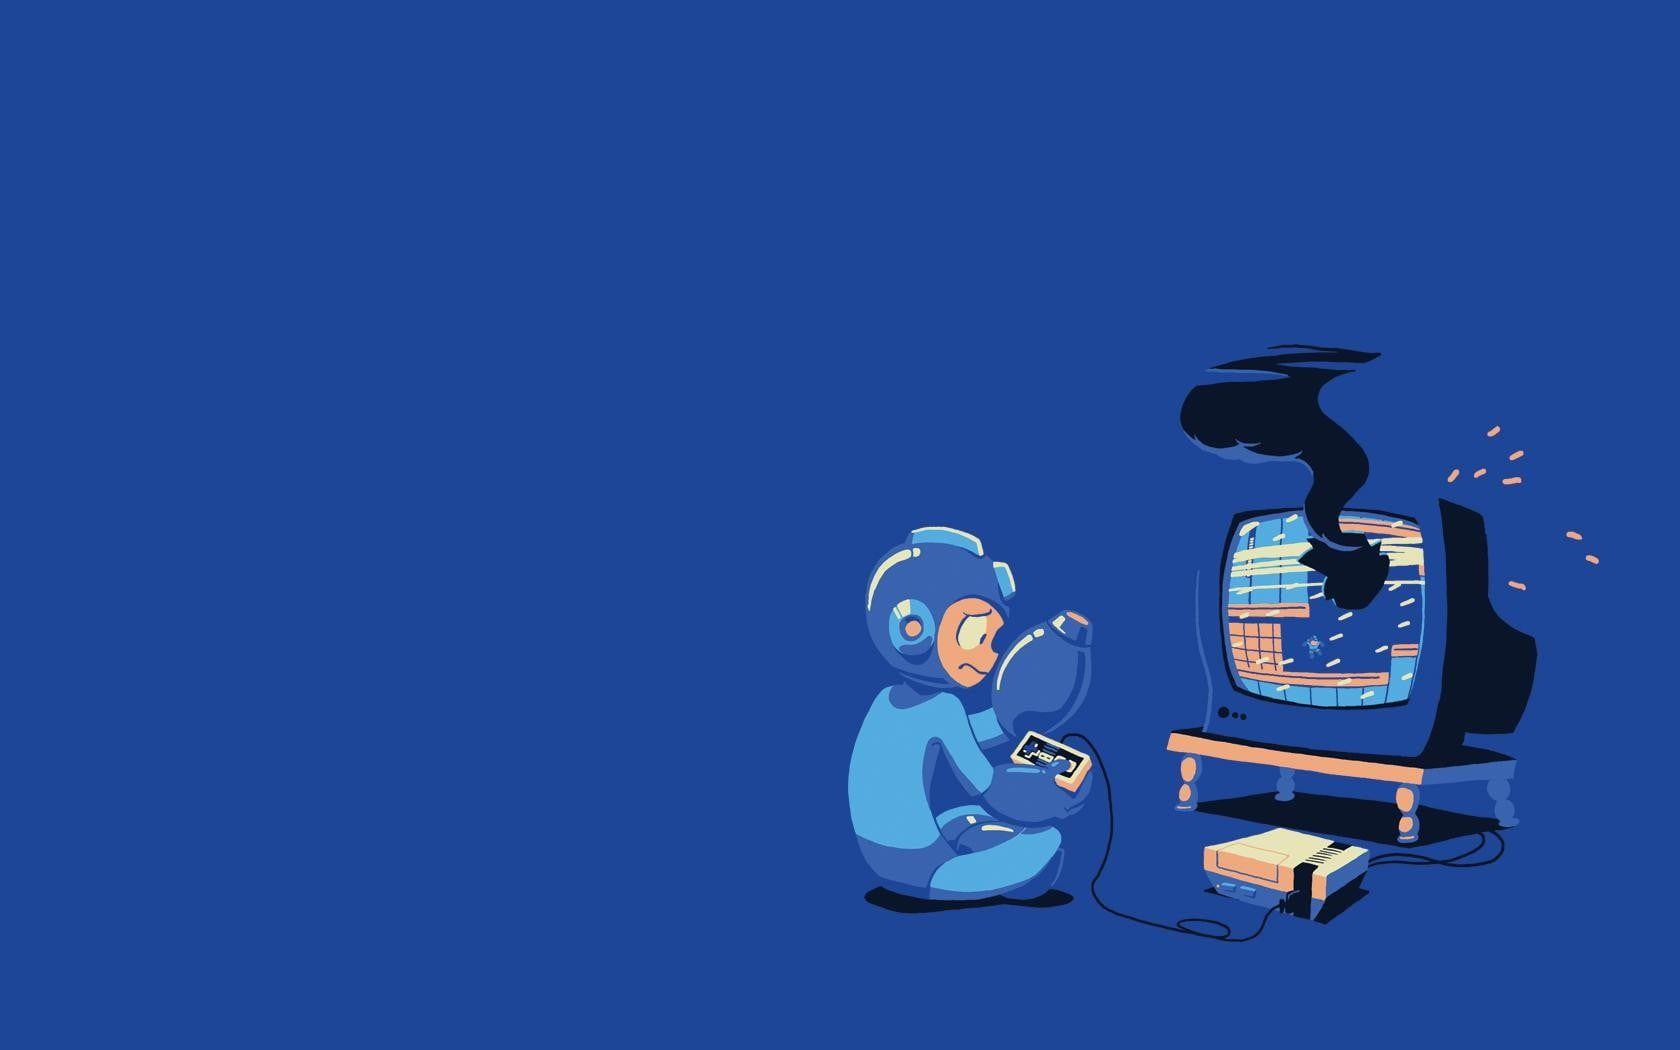 Megaman Illustration Mega Man Nintendo 720p Wallpaper Hdwallpaper Desktop Mega Man Man Wallpaper Funny Facebook Cover